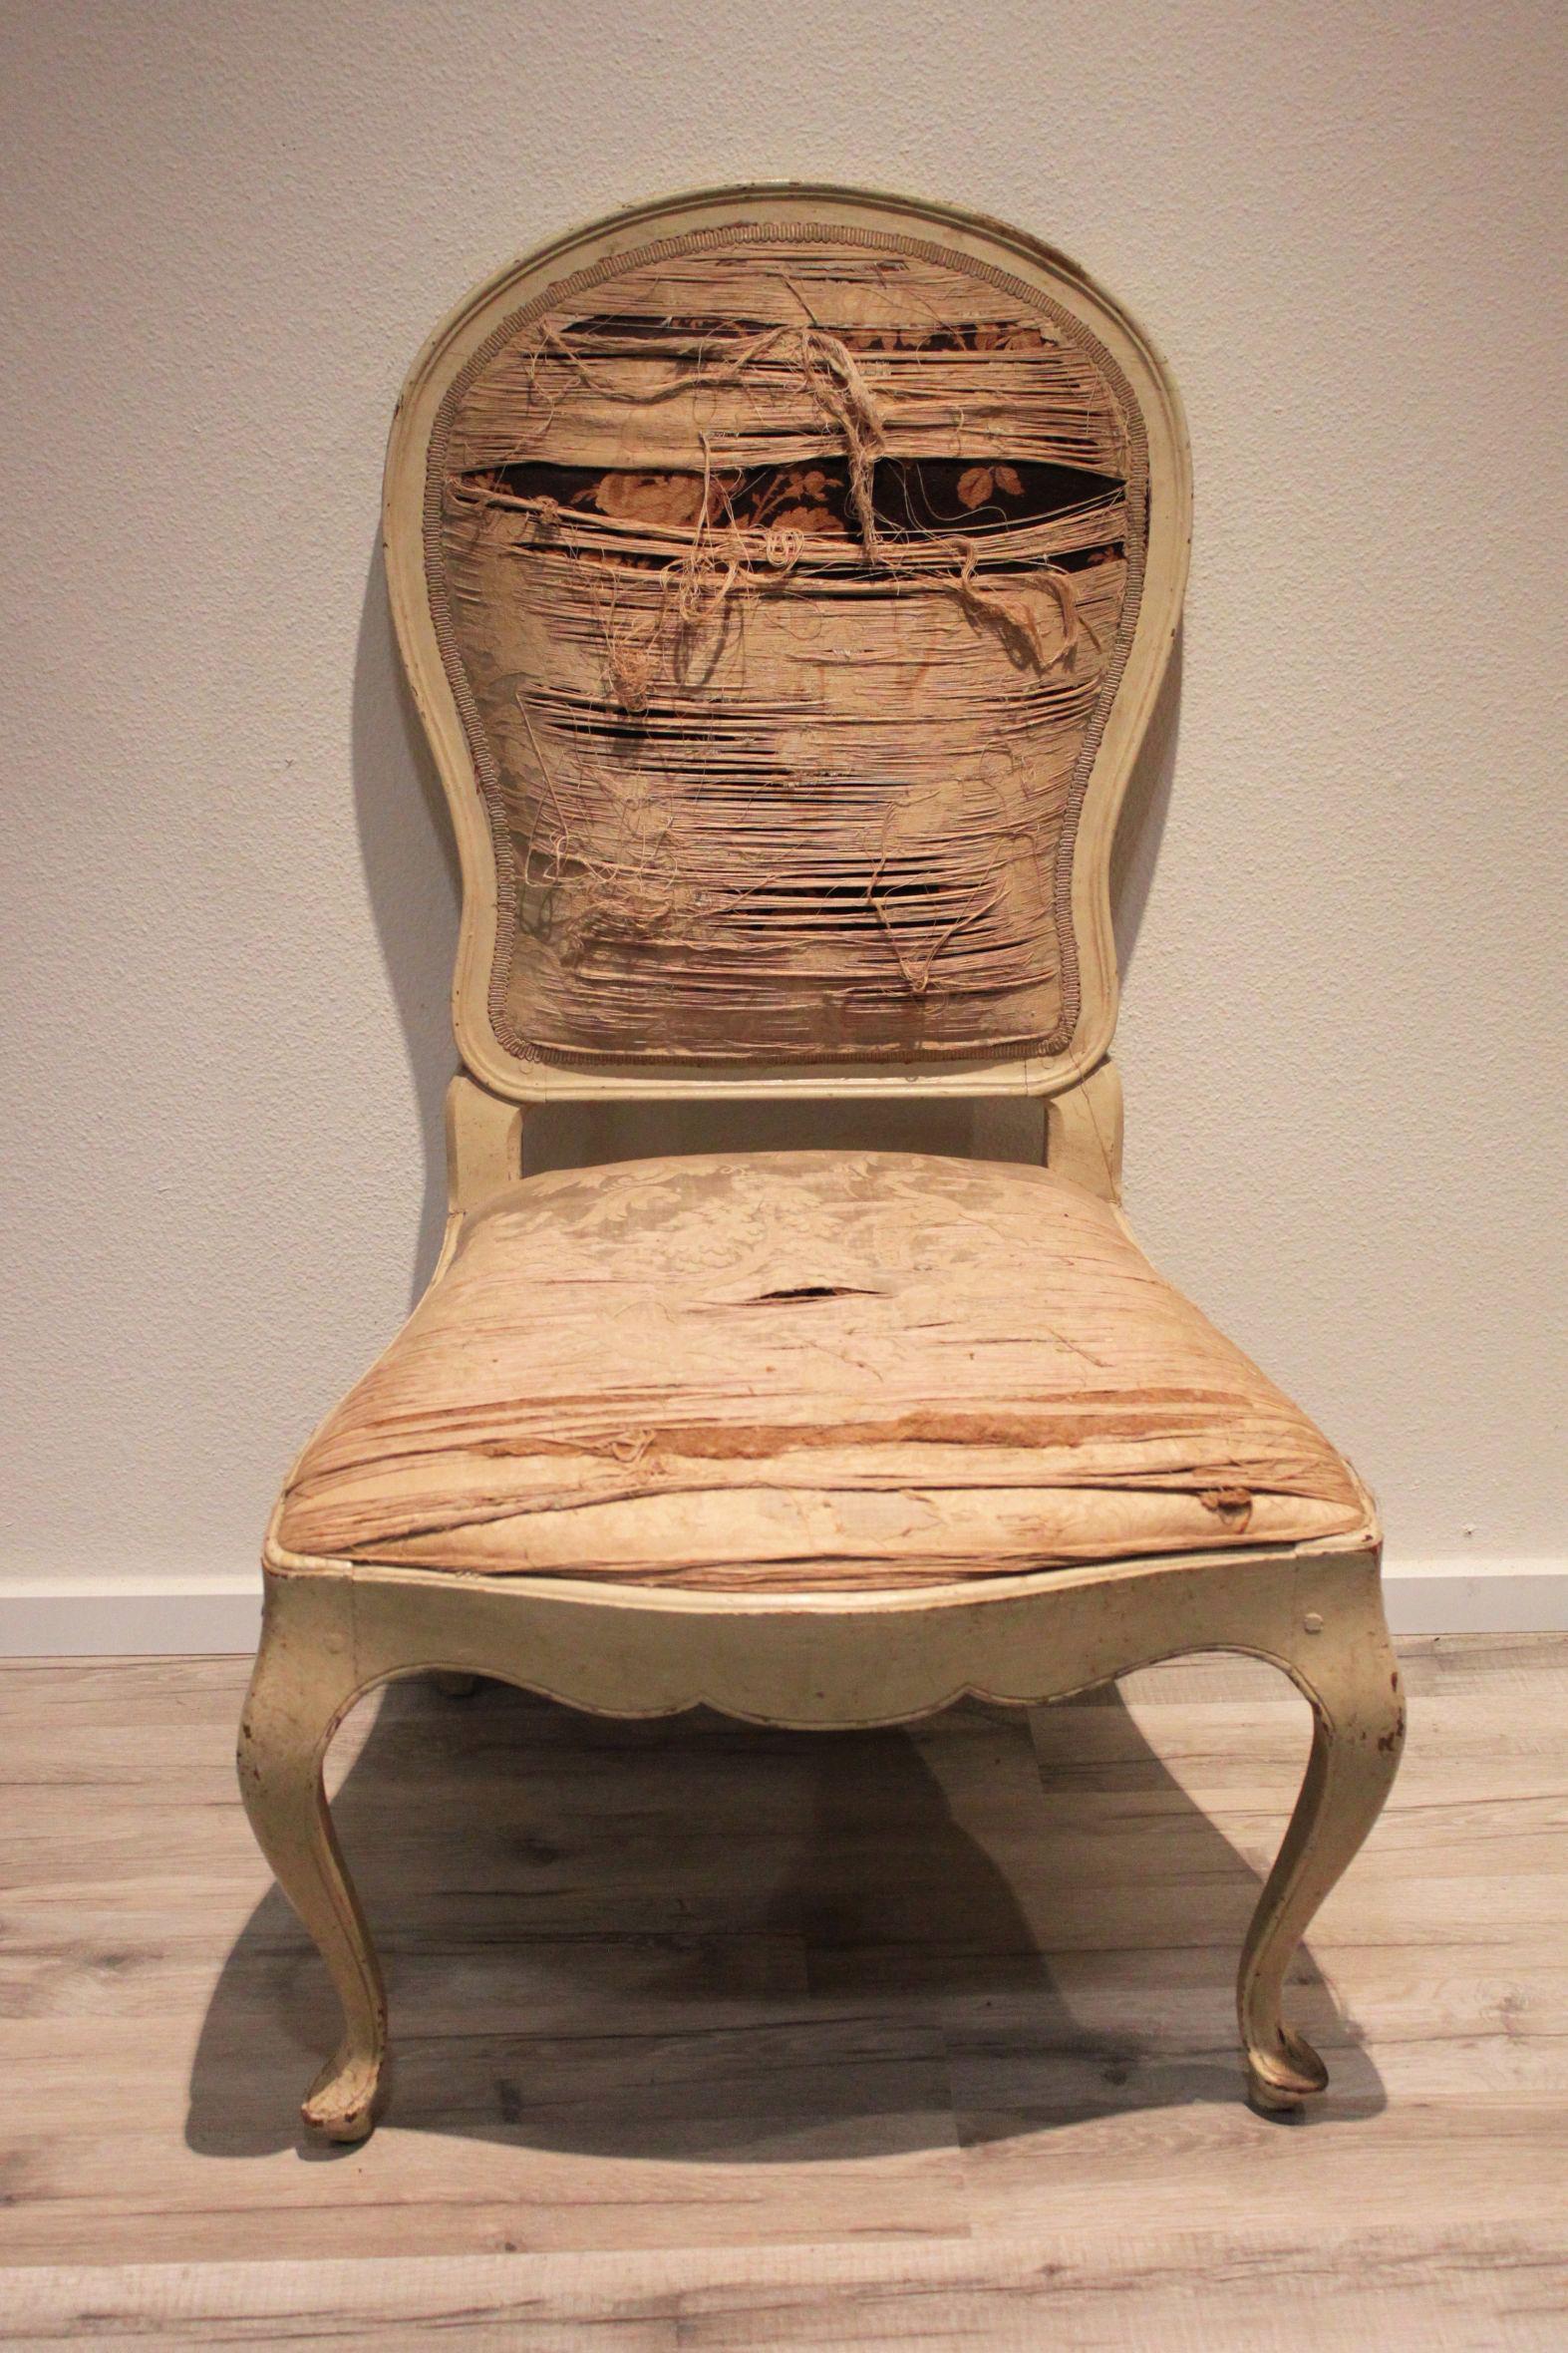 Louis Quinze Stuhl Holz Weiß Gefaßt Möbel Sessel Stühle